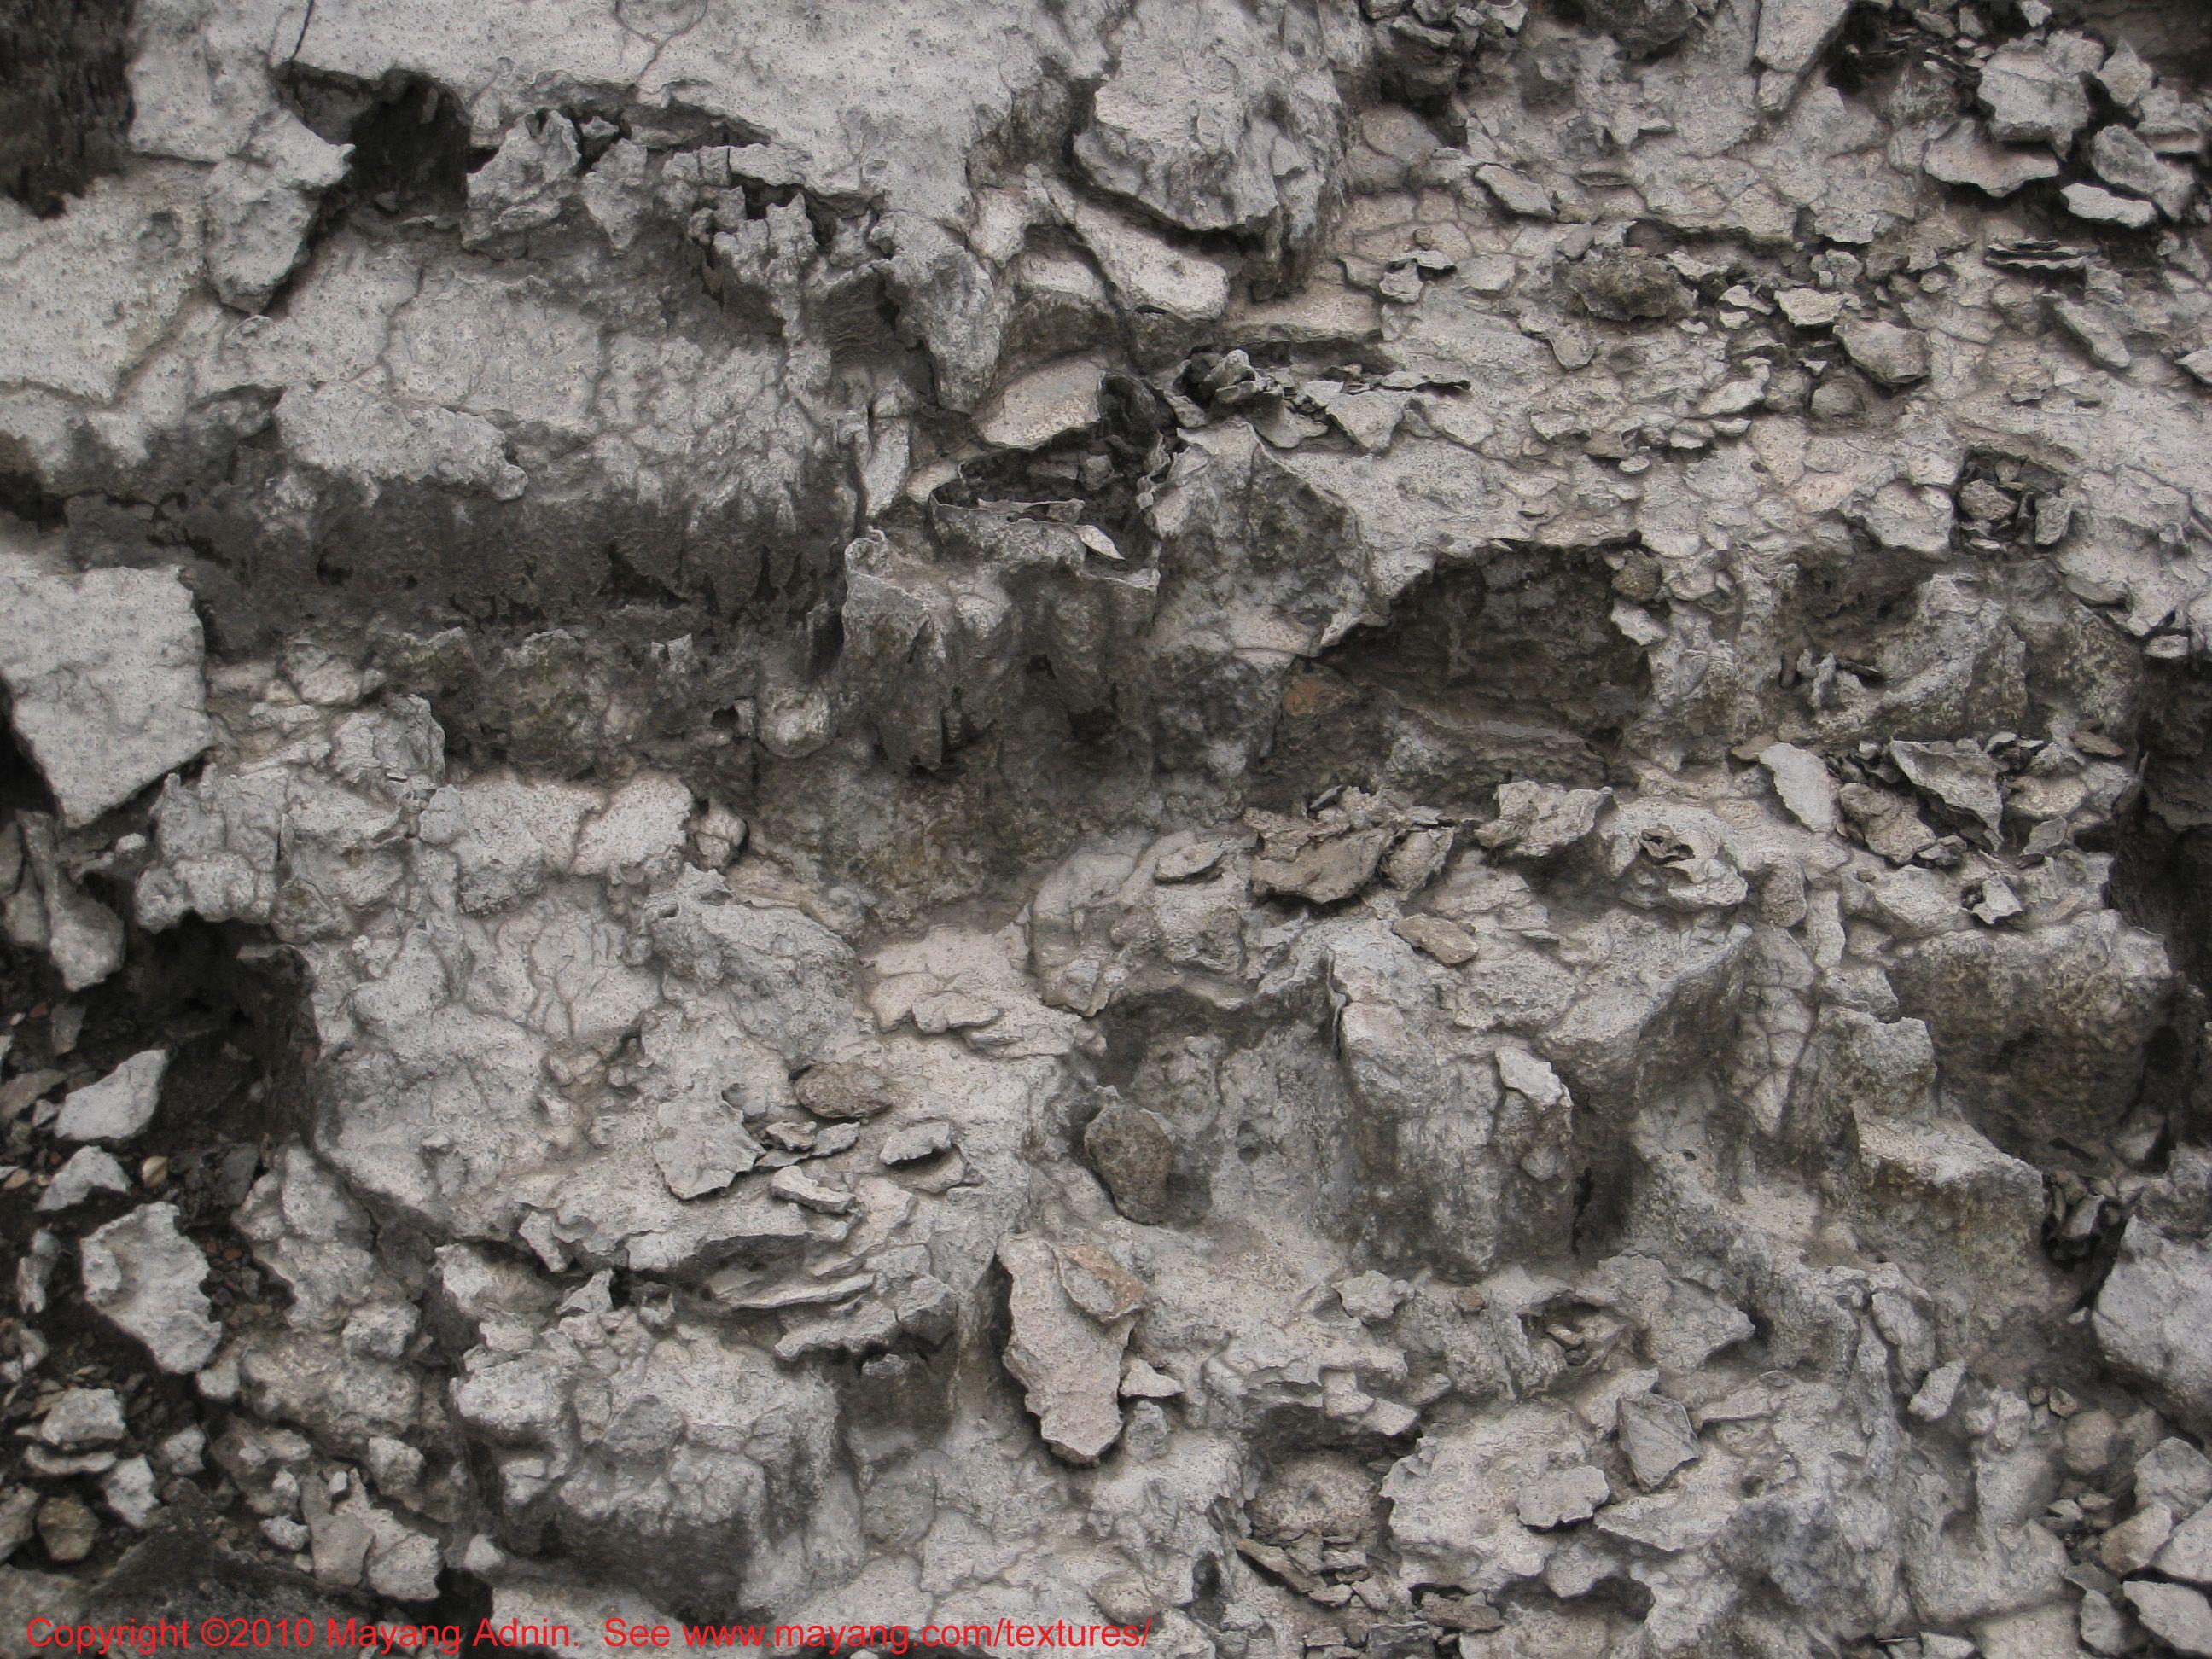 Lava texture bing images - Solidified_lava_rocks_0506 Jpg 2 592 1 944 Pixels Lavatexture